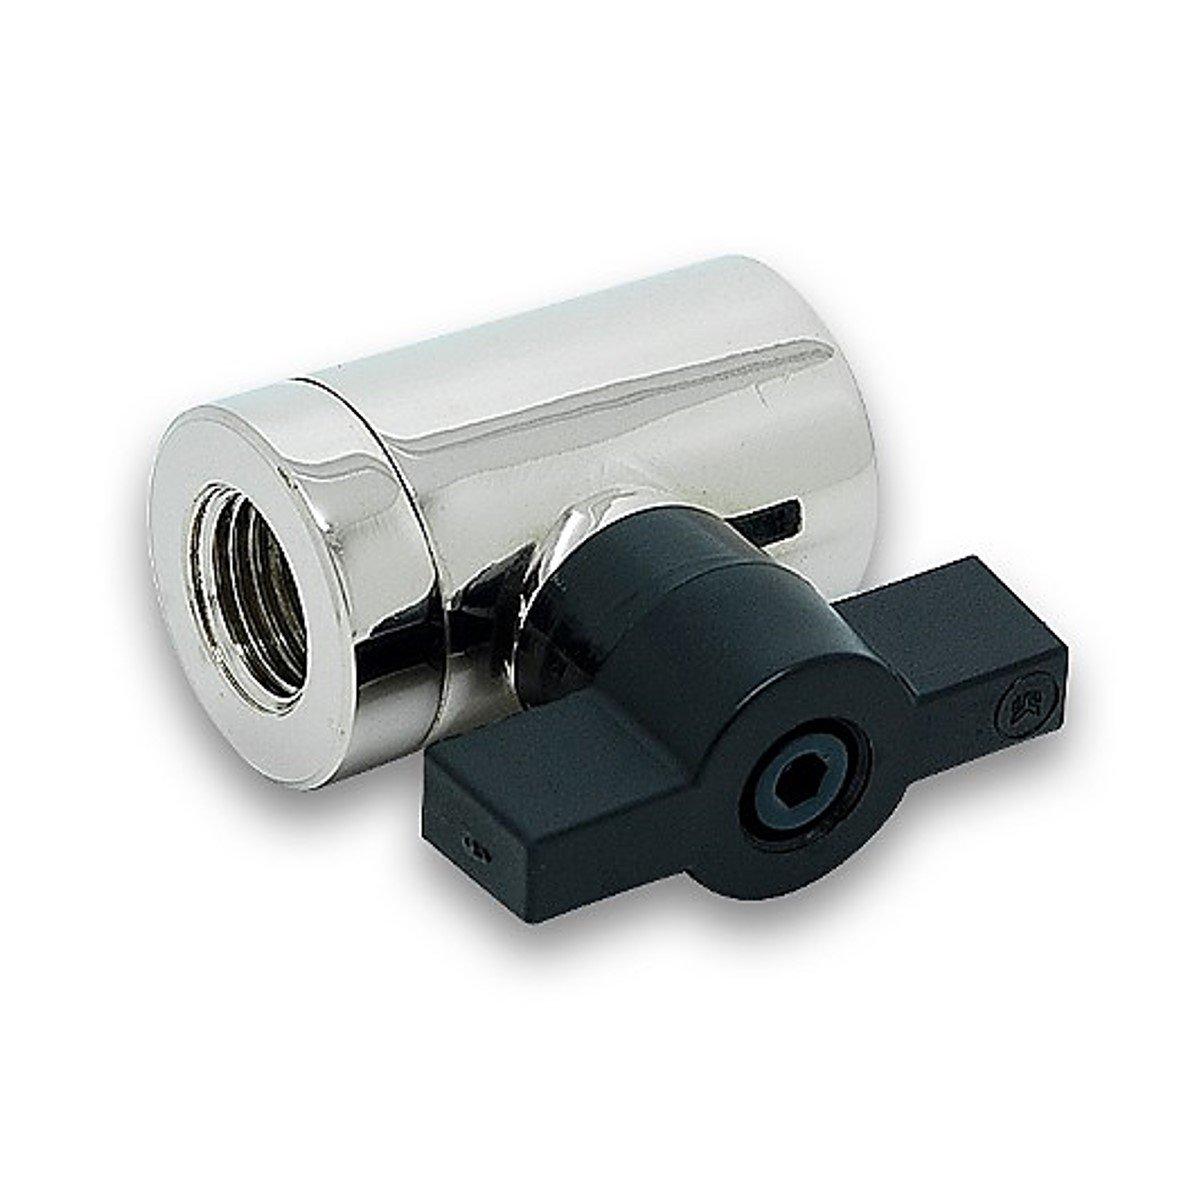 "EKWB EK-AF G1/4"" 10mm Ball Valve, Nickel"